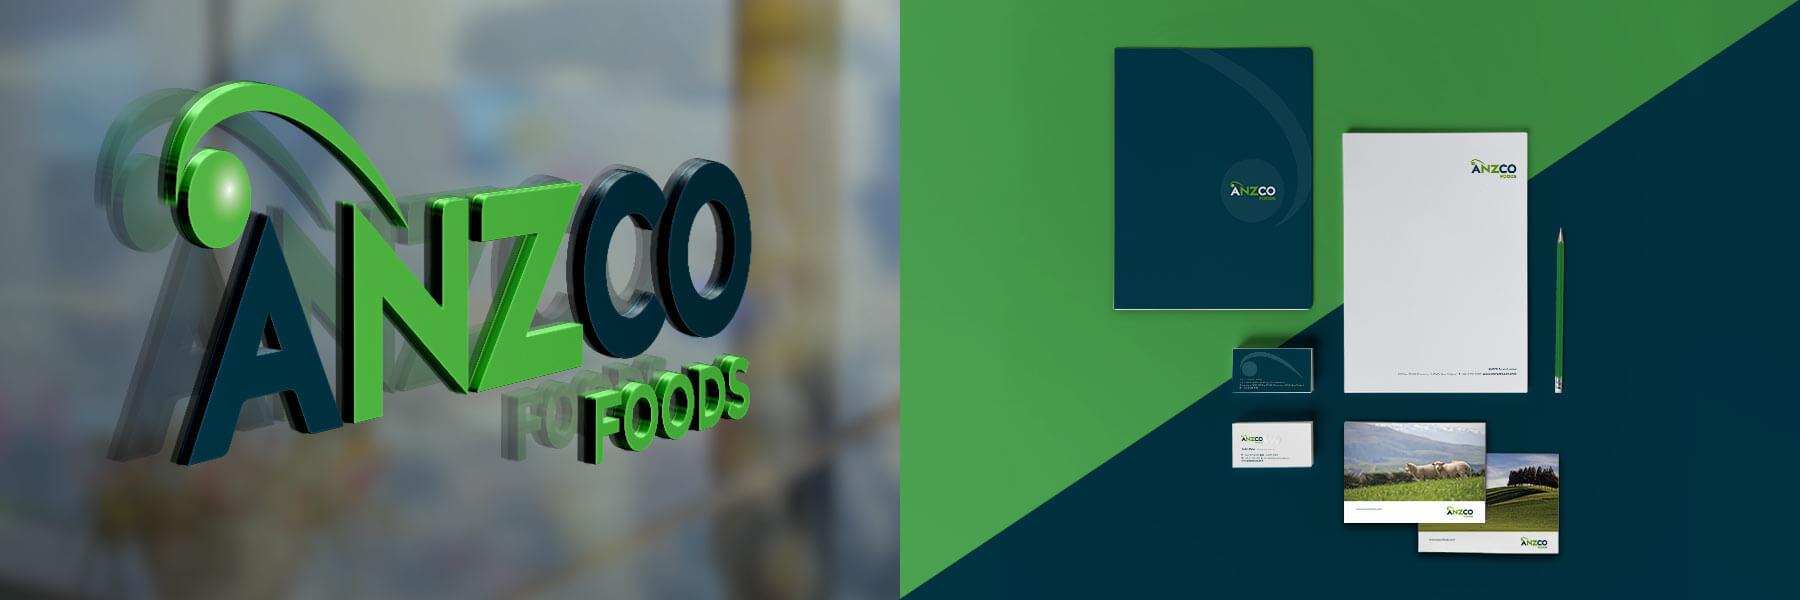 portfolio-ANZCO-signage-stationery.jpg